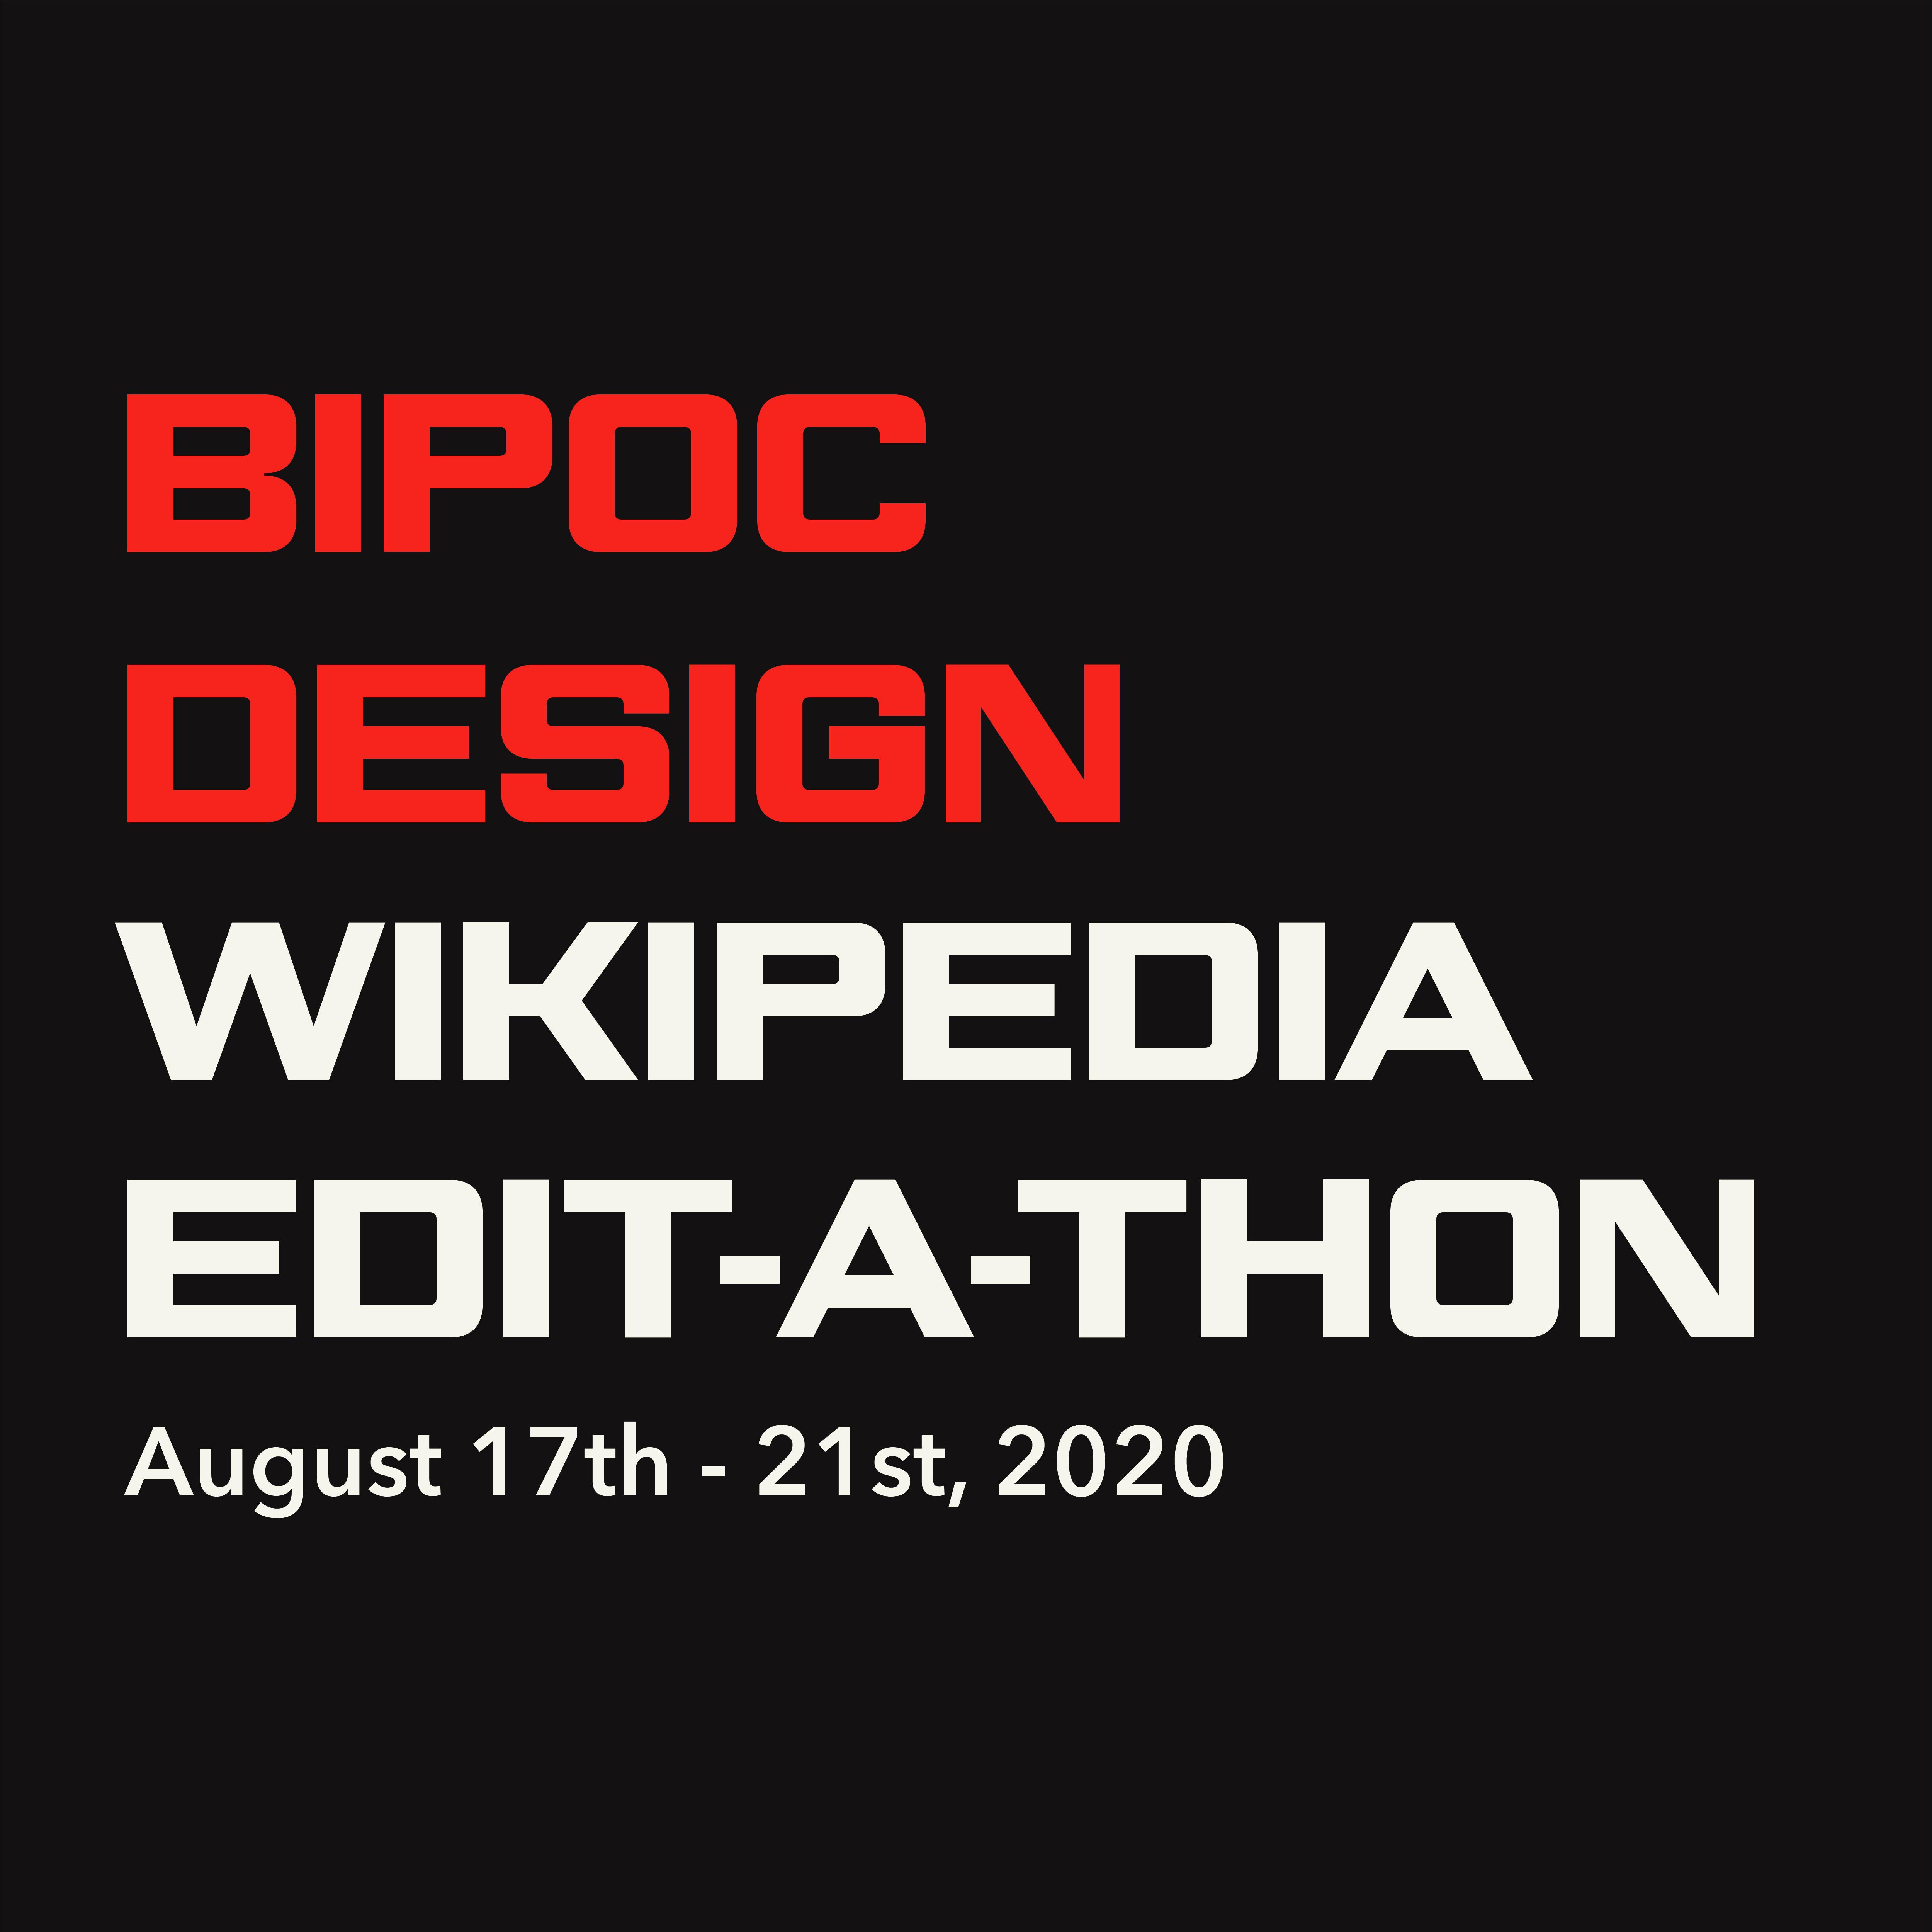 BIPOC Design Wikipedia Edit-a-thon